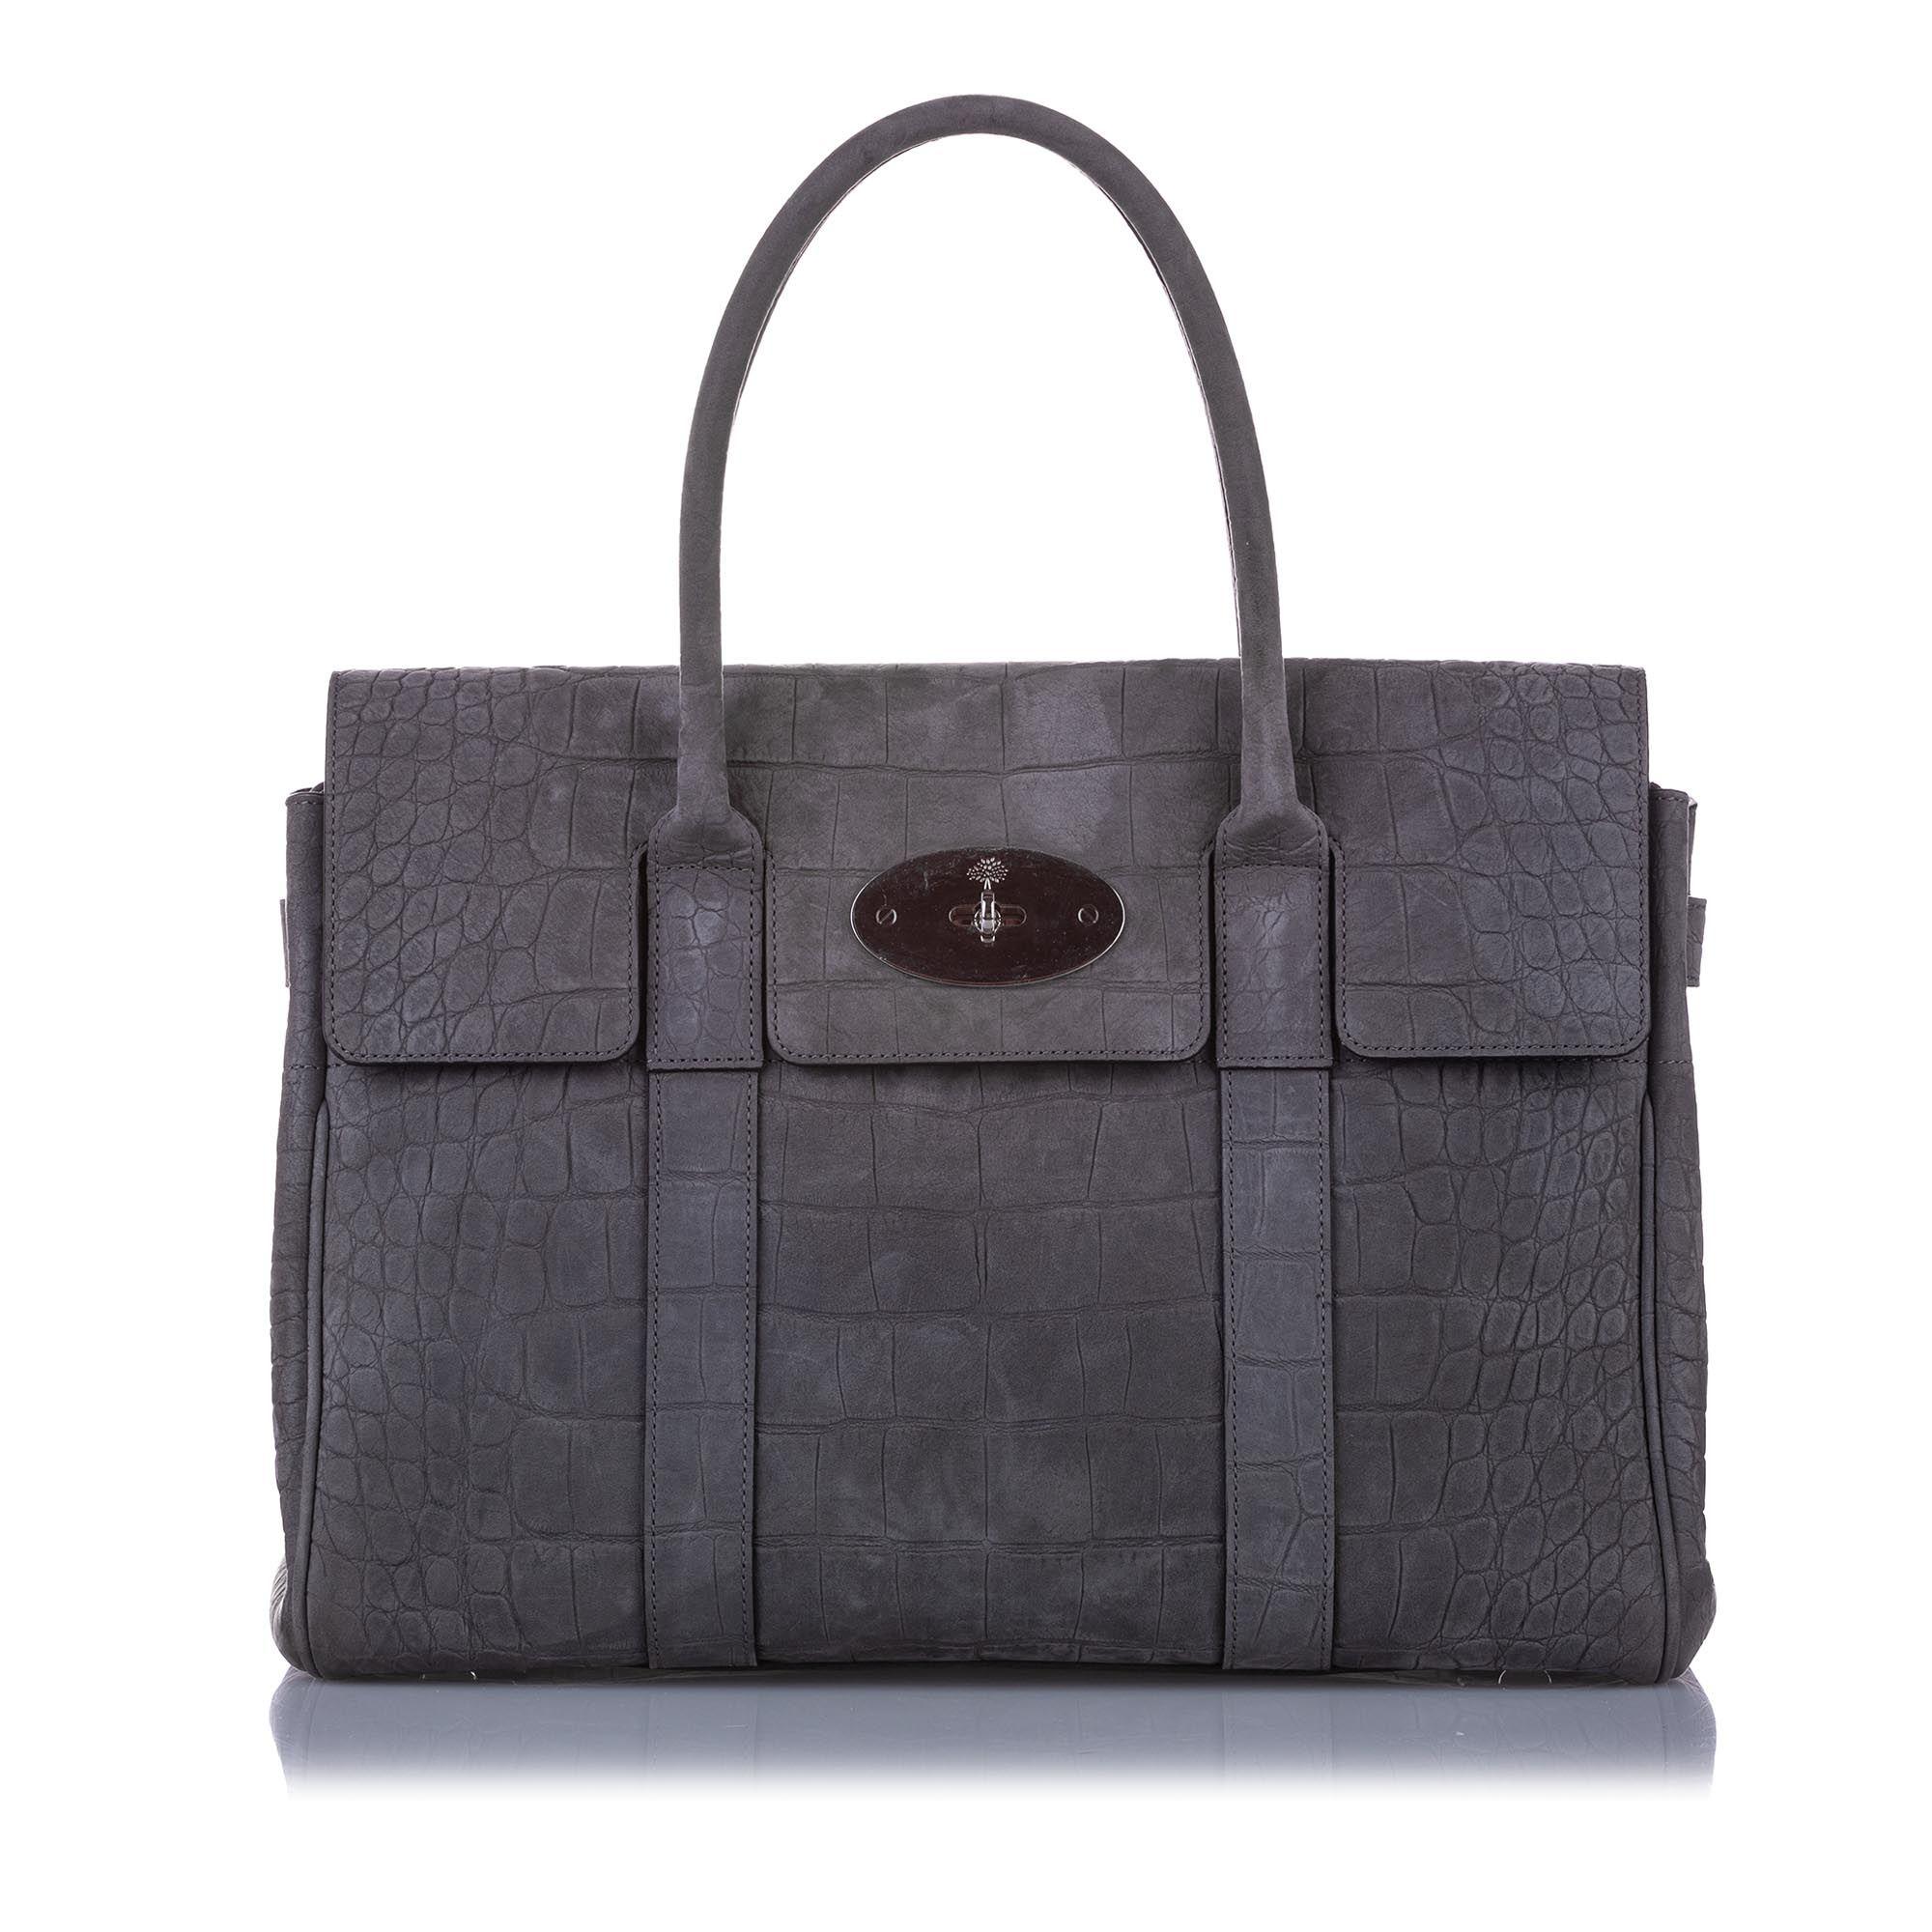 Vintage Mulberry Embossed Bayswater Suede Handbag Gray